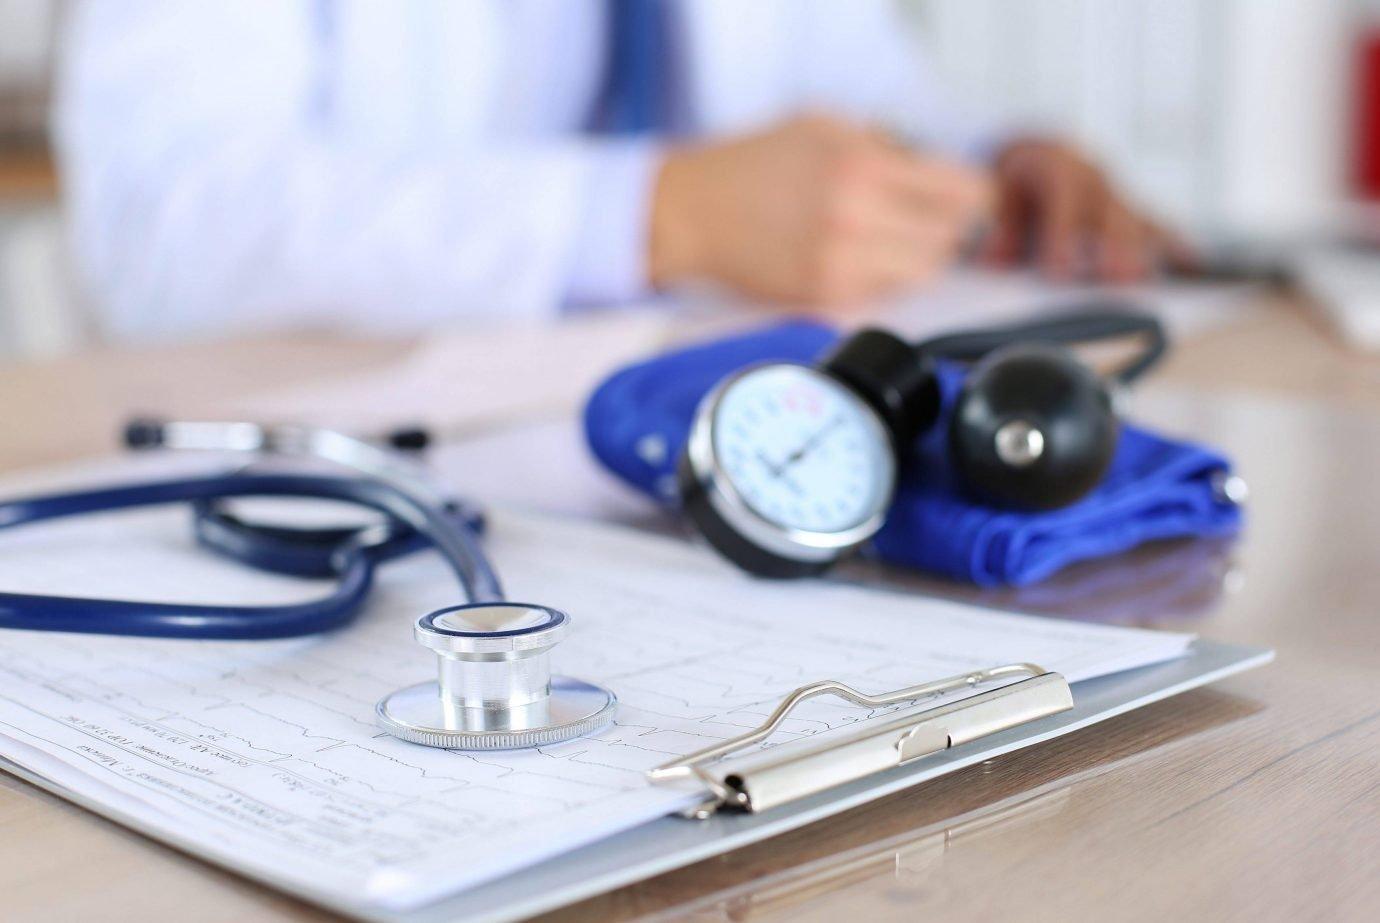 Médicos, planos de saúde, medicina